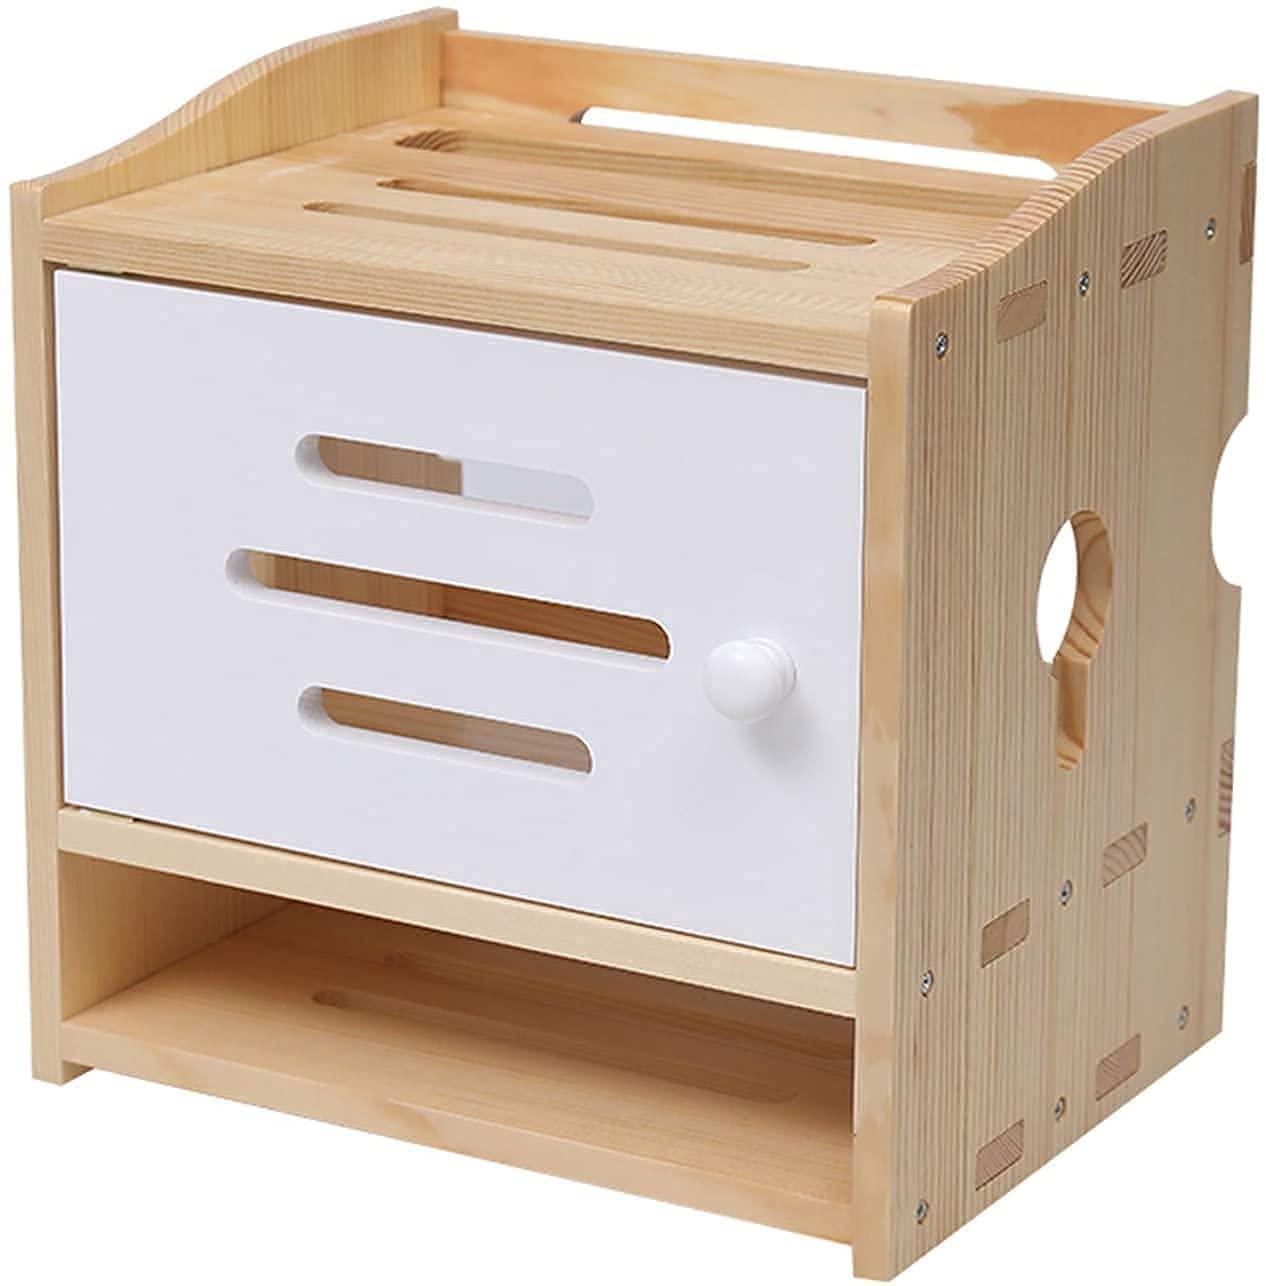 FXBFAG 부동 선반 선반 라우터 잘 고정된 라우터 저장에 주최자이자 케이블로 저장 상자 뜨 TV 셋톱 박스 선반 모뎀 케이블 박스 케이블 깔끔한자 나무 목재(색상:백색)